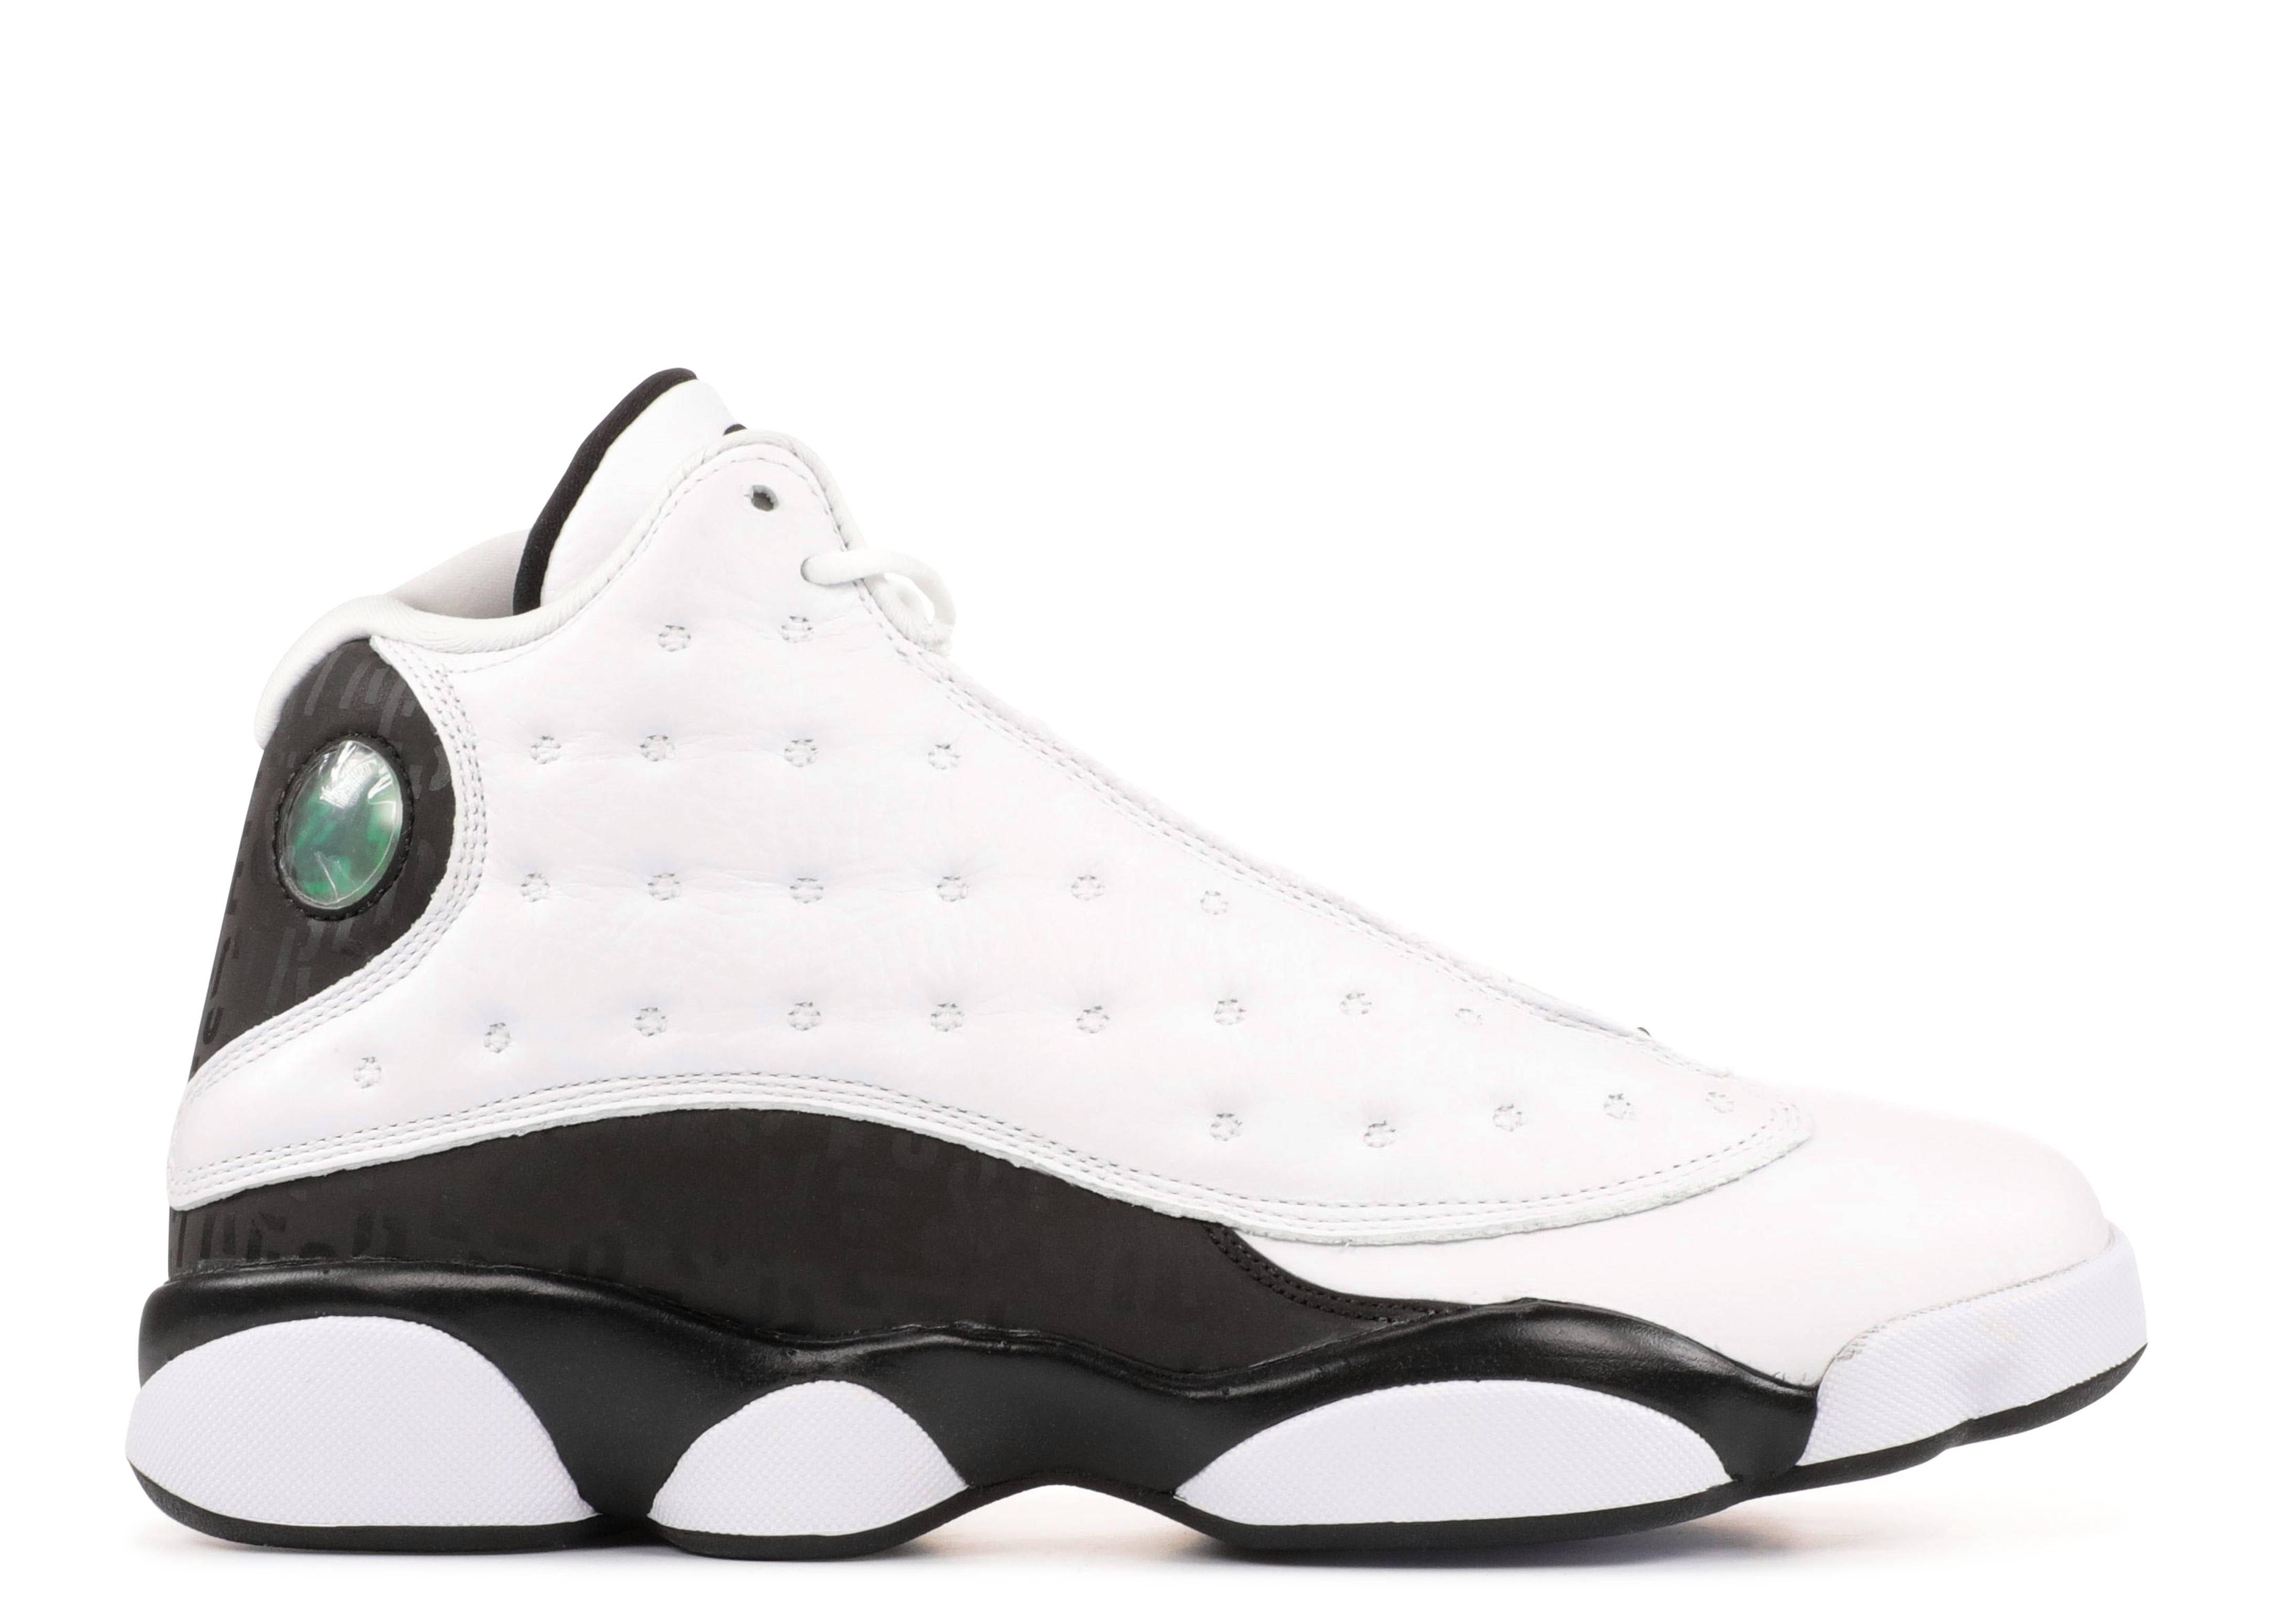 98988433f6badc Air Jordan 13 (XIII) Shoes - Nike